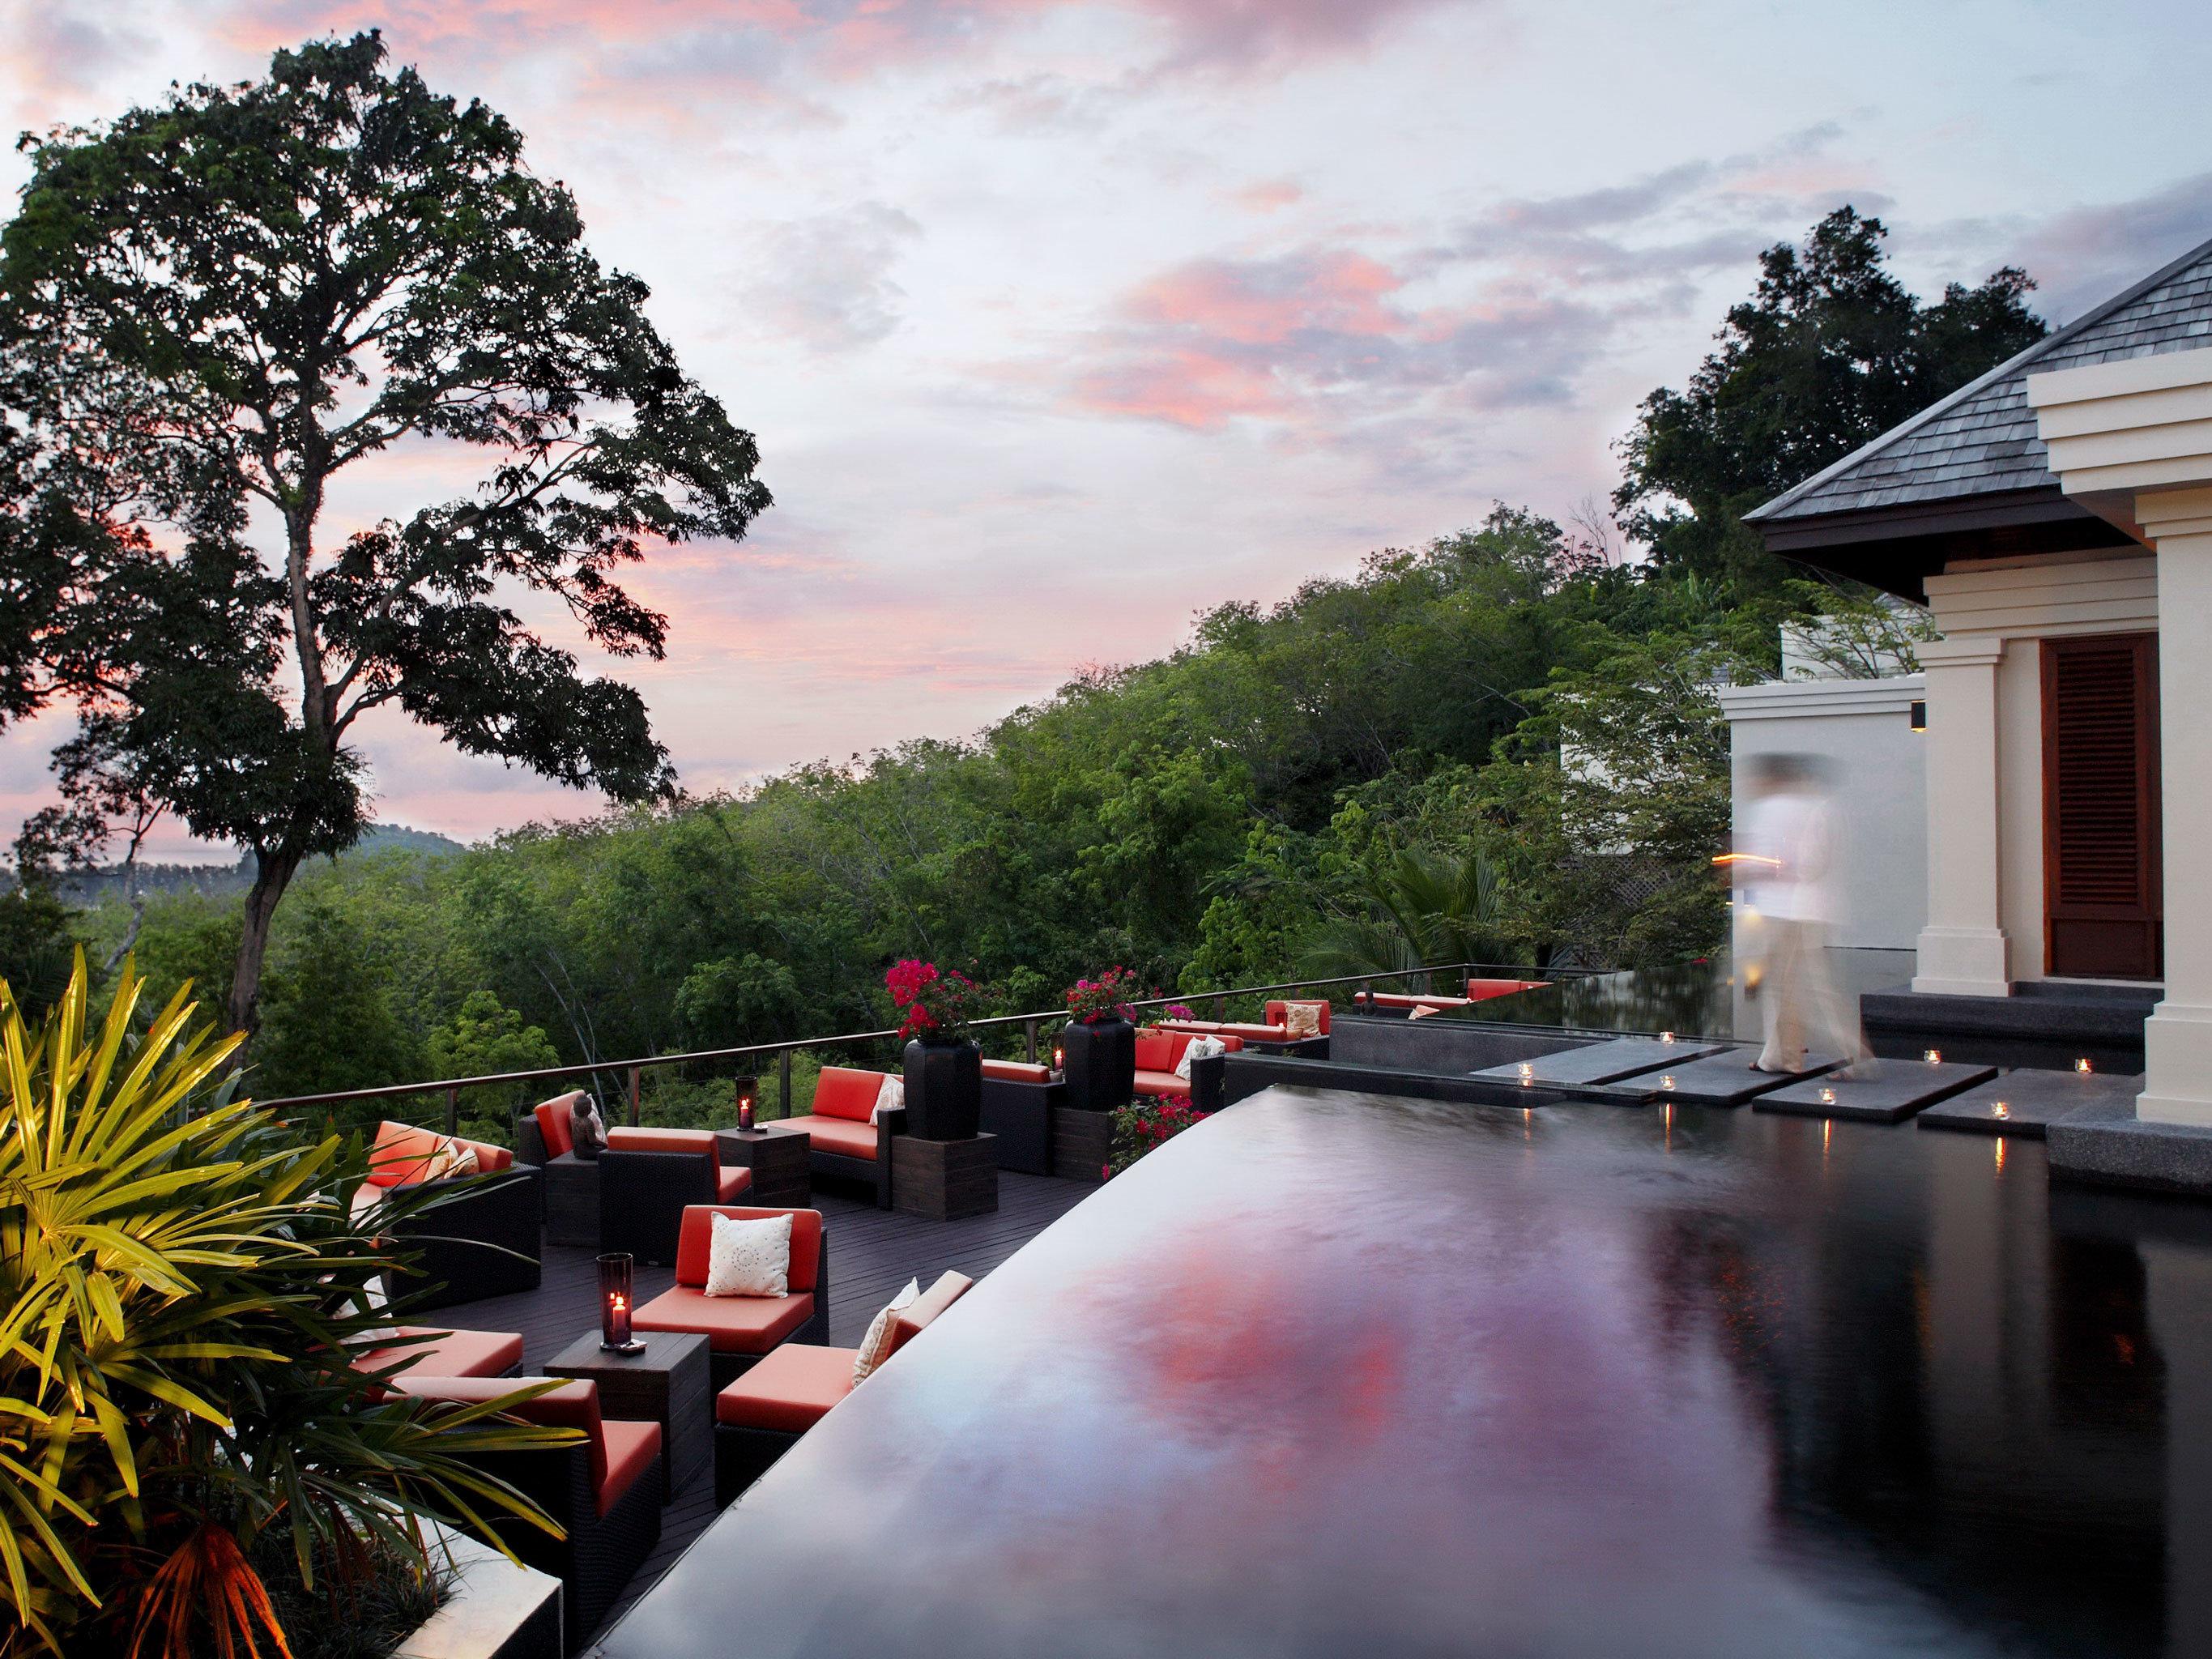 Beachfront Dining Grounds Luxury Modern Pool tree sky house season flower home waterway Garden autumn lined